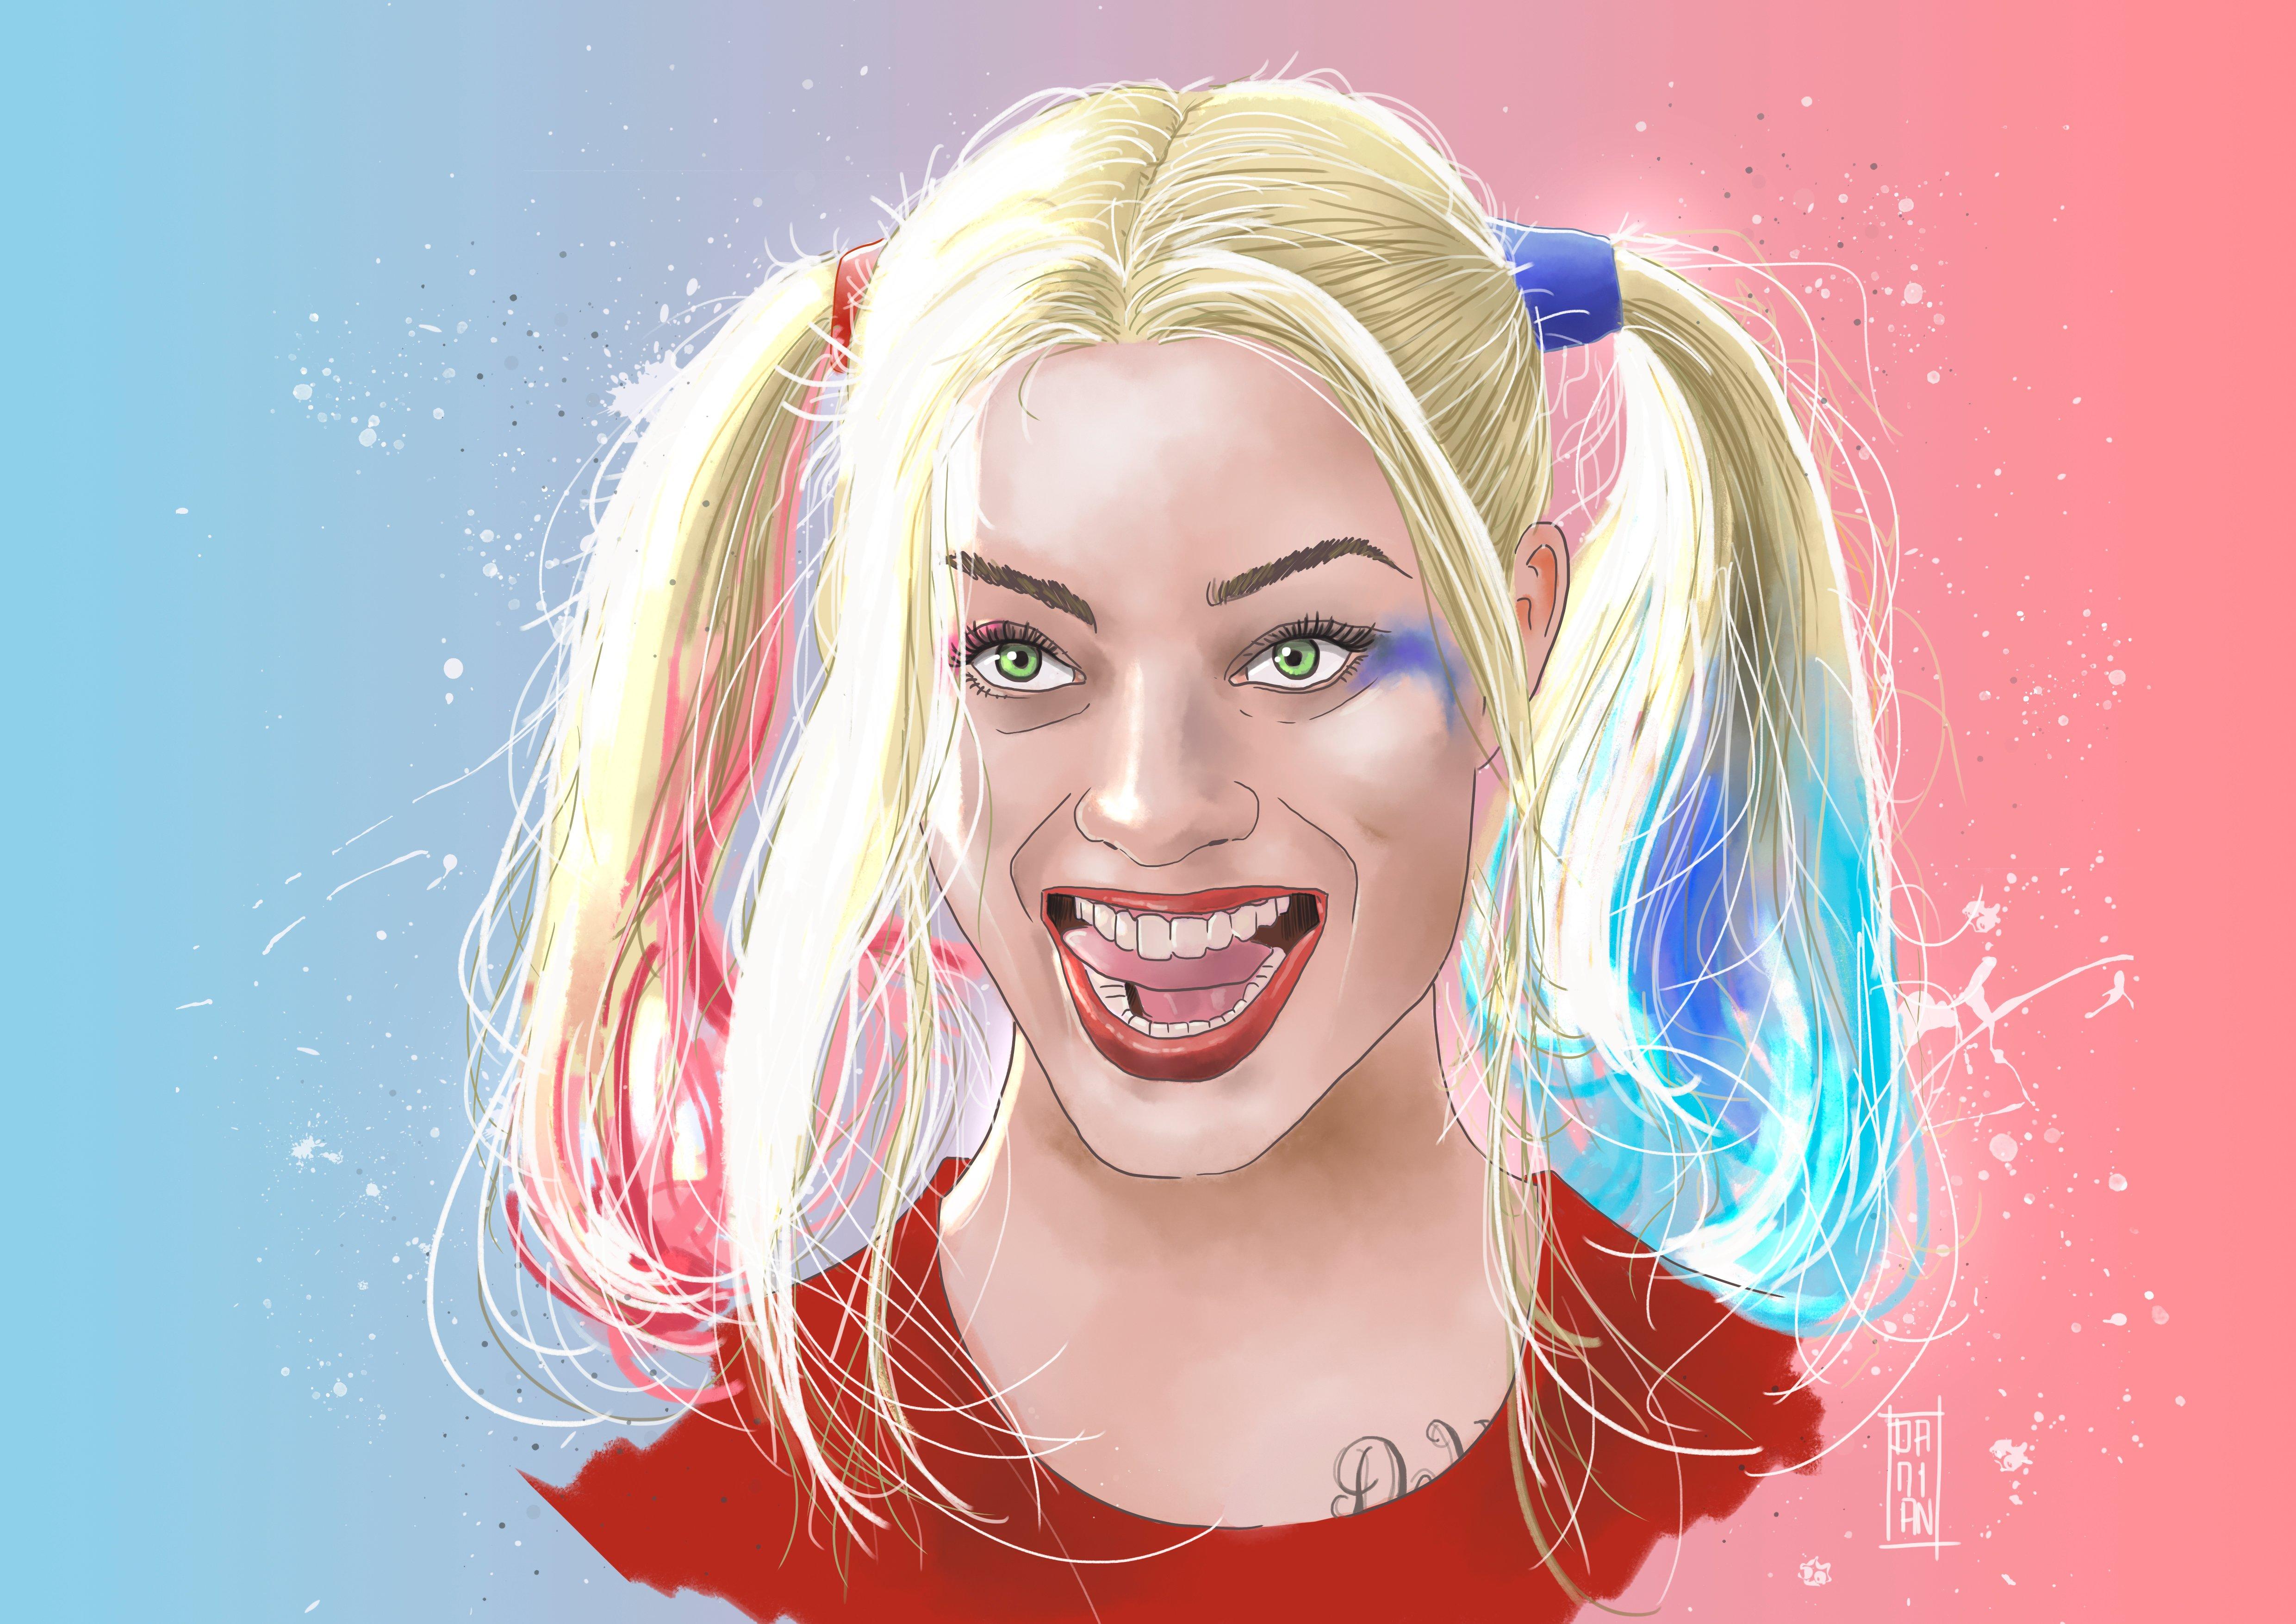 Fondos de pantalla Artwork de Harley Quinn